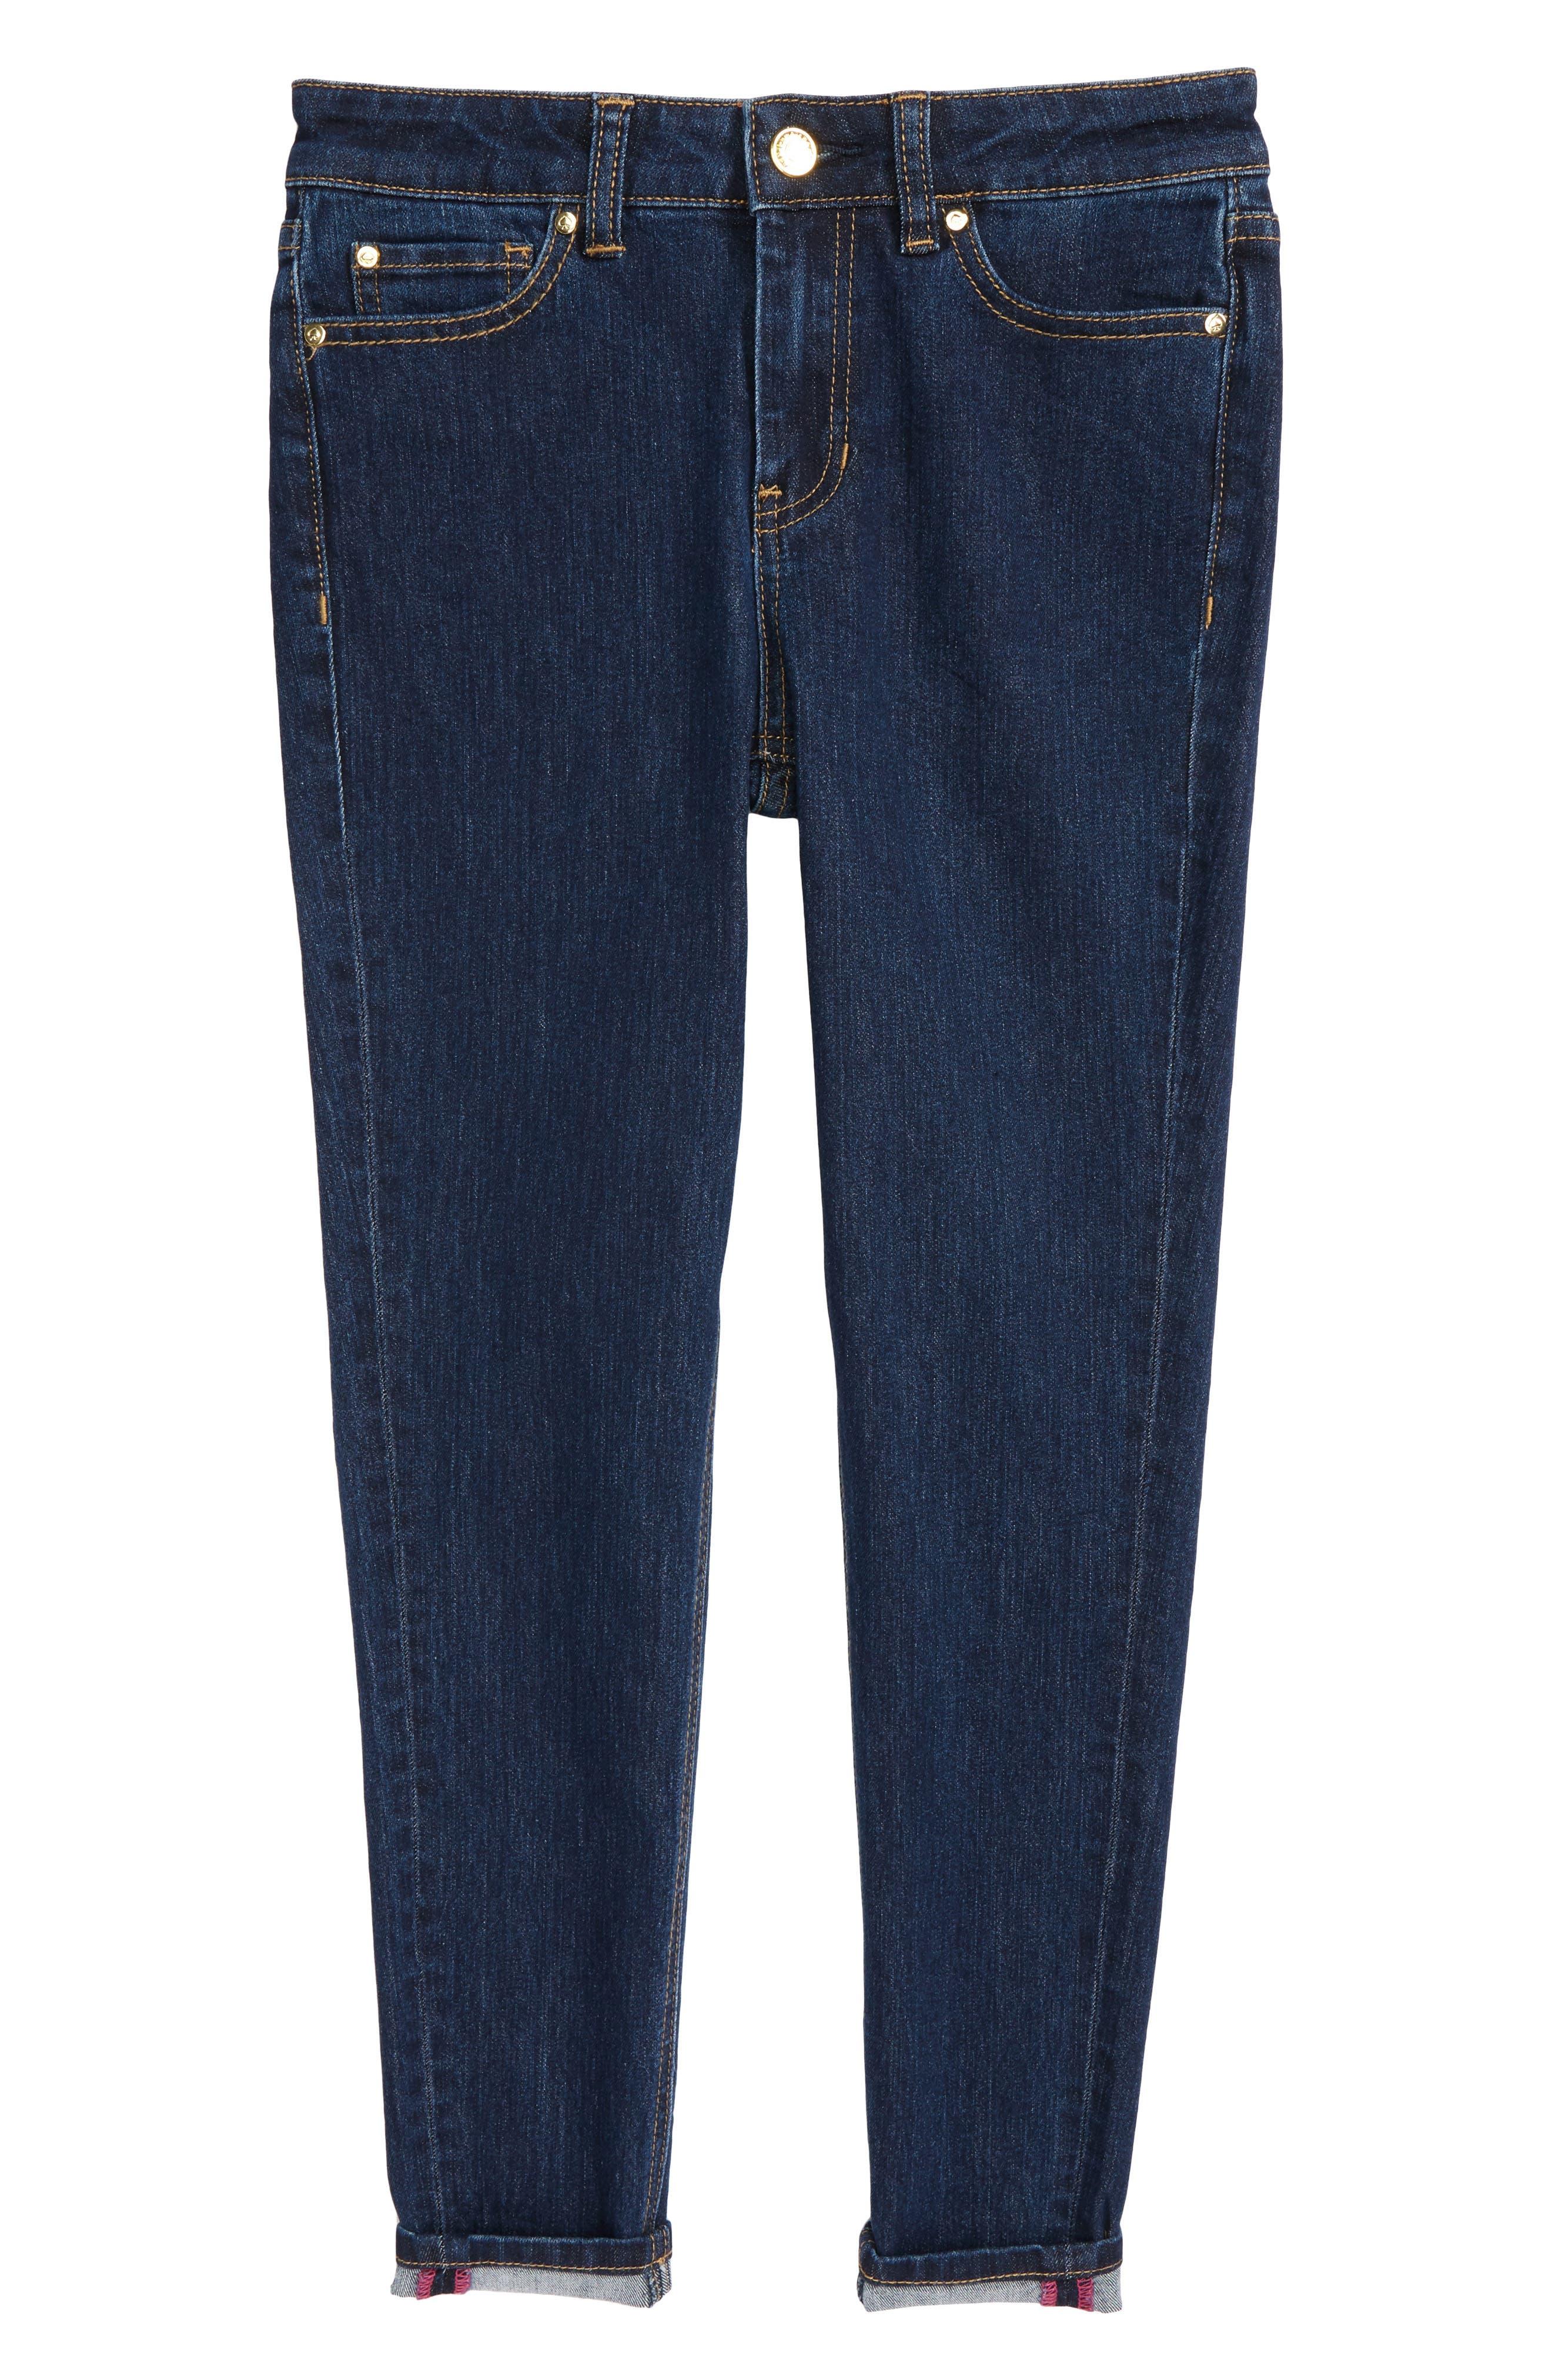 skinny jeans,                         Main,                         color, Denim Indigo